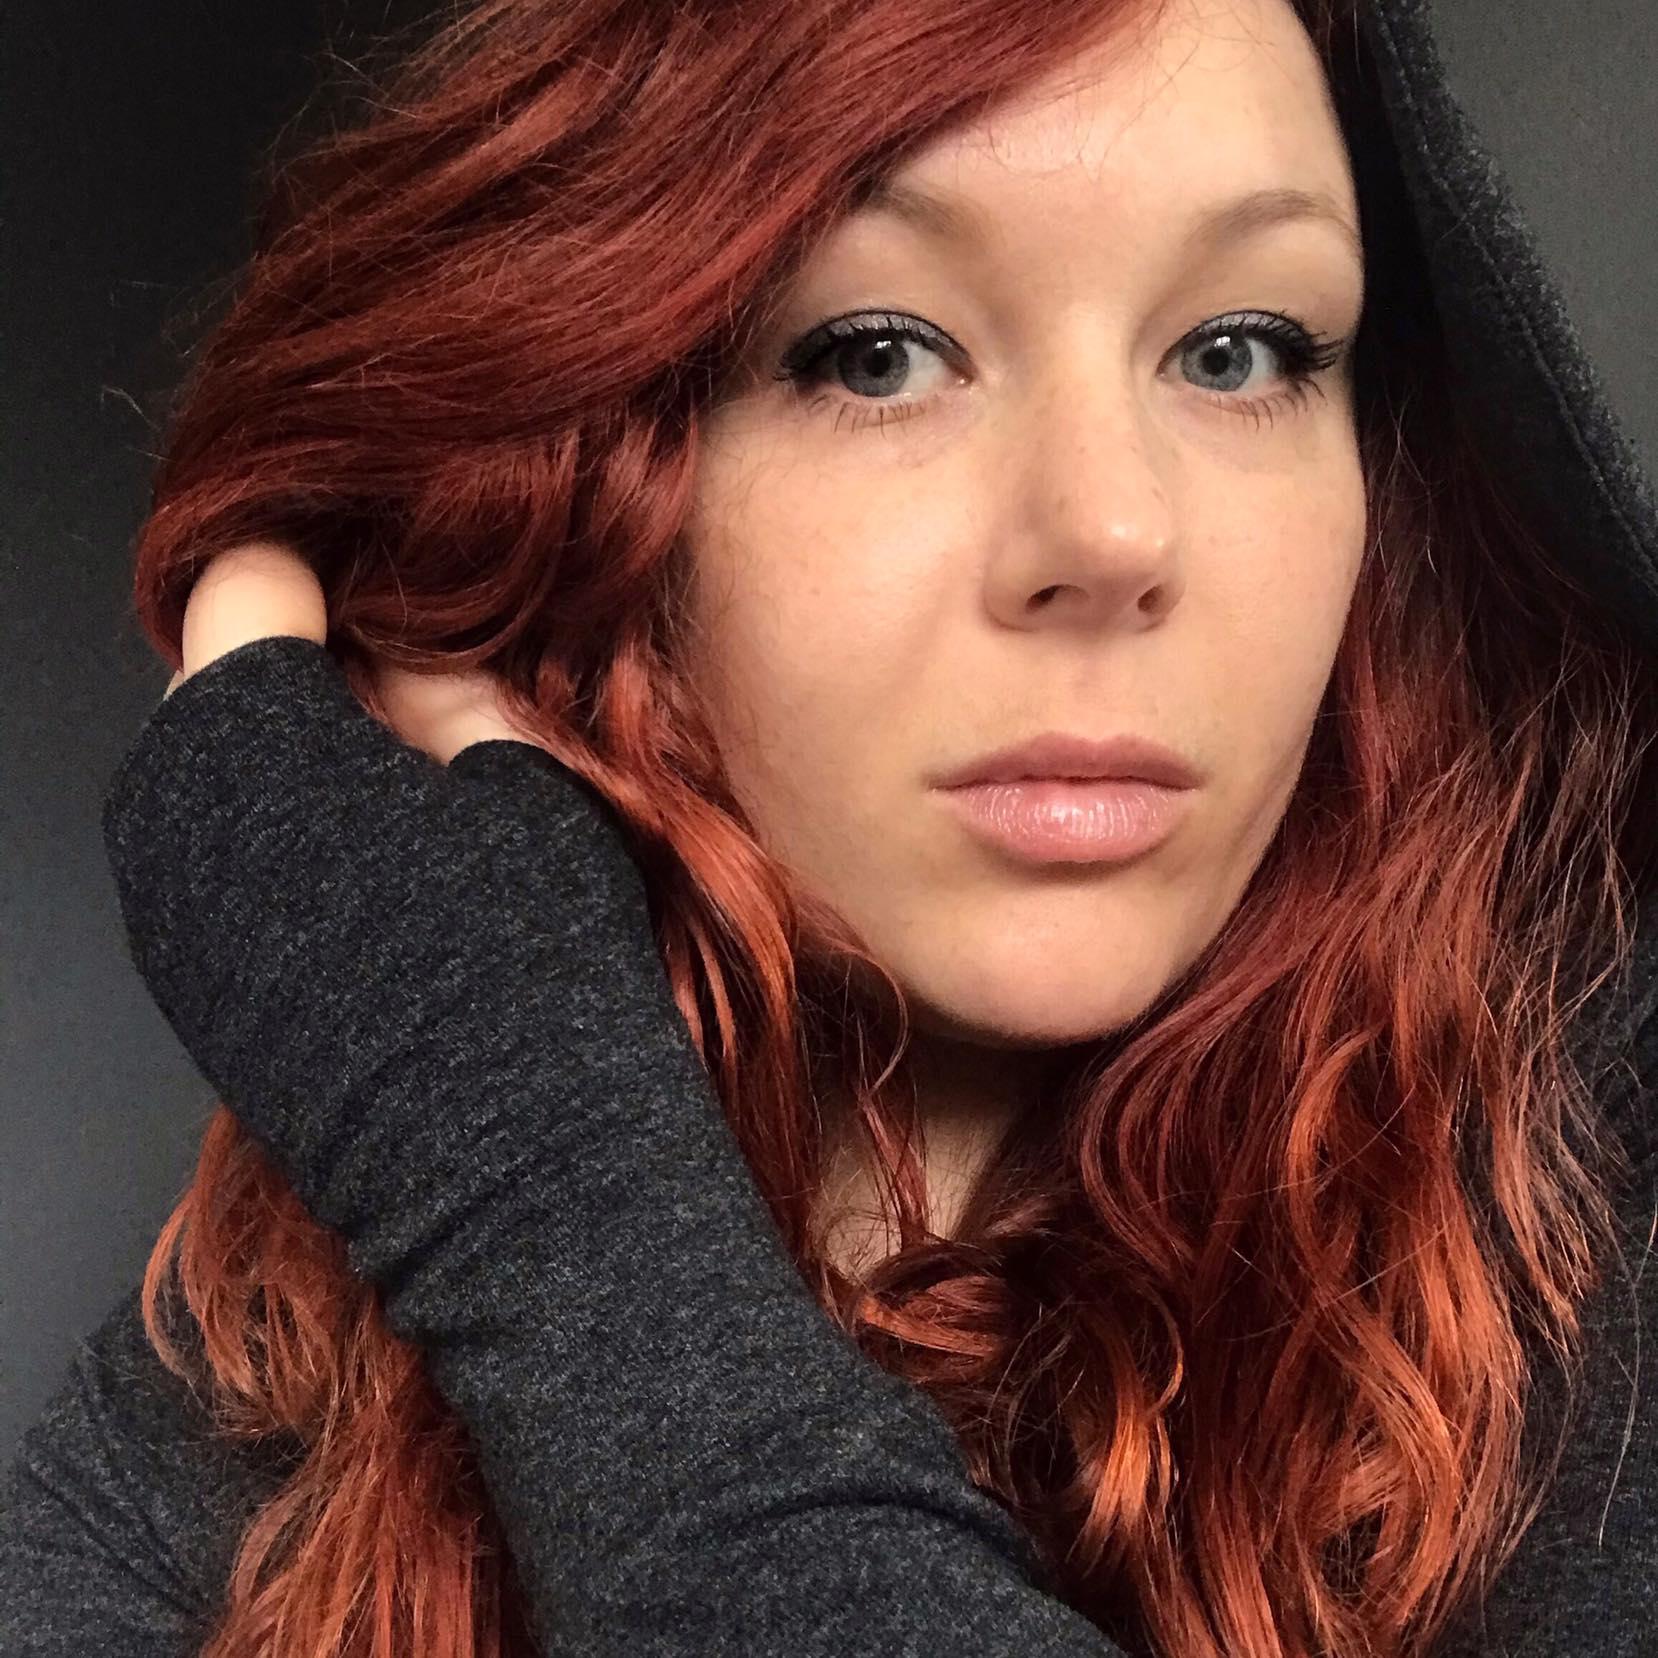 Надя Шишканюк